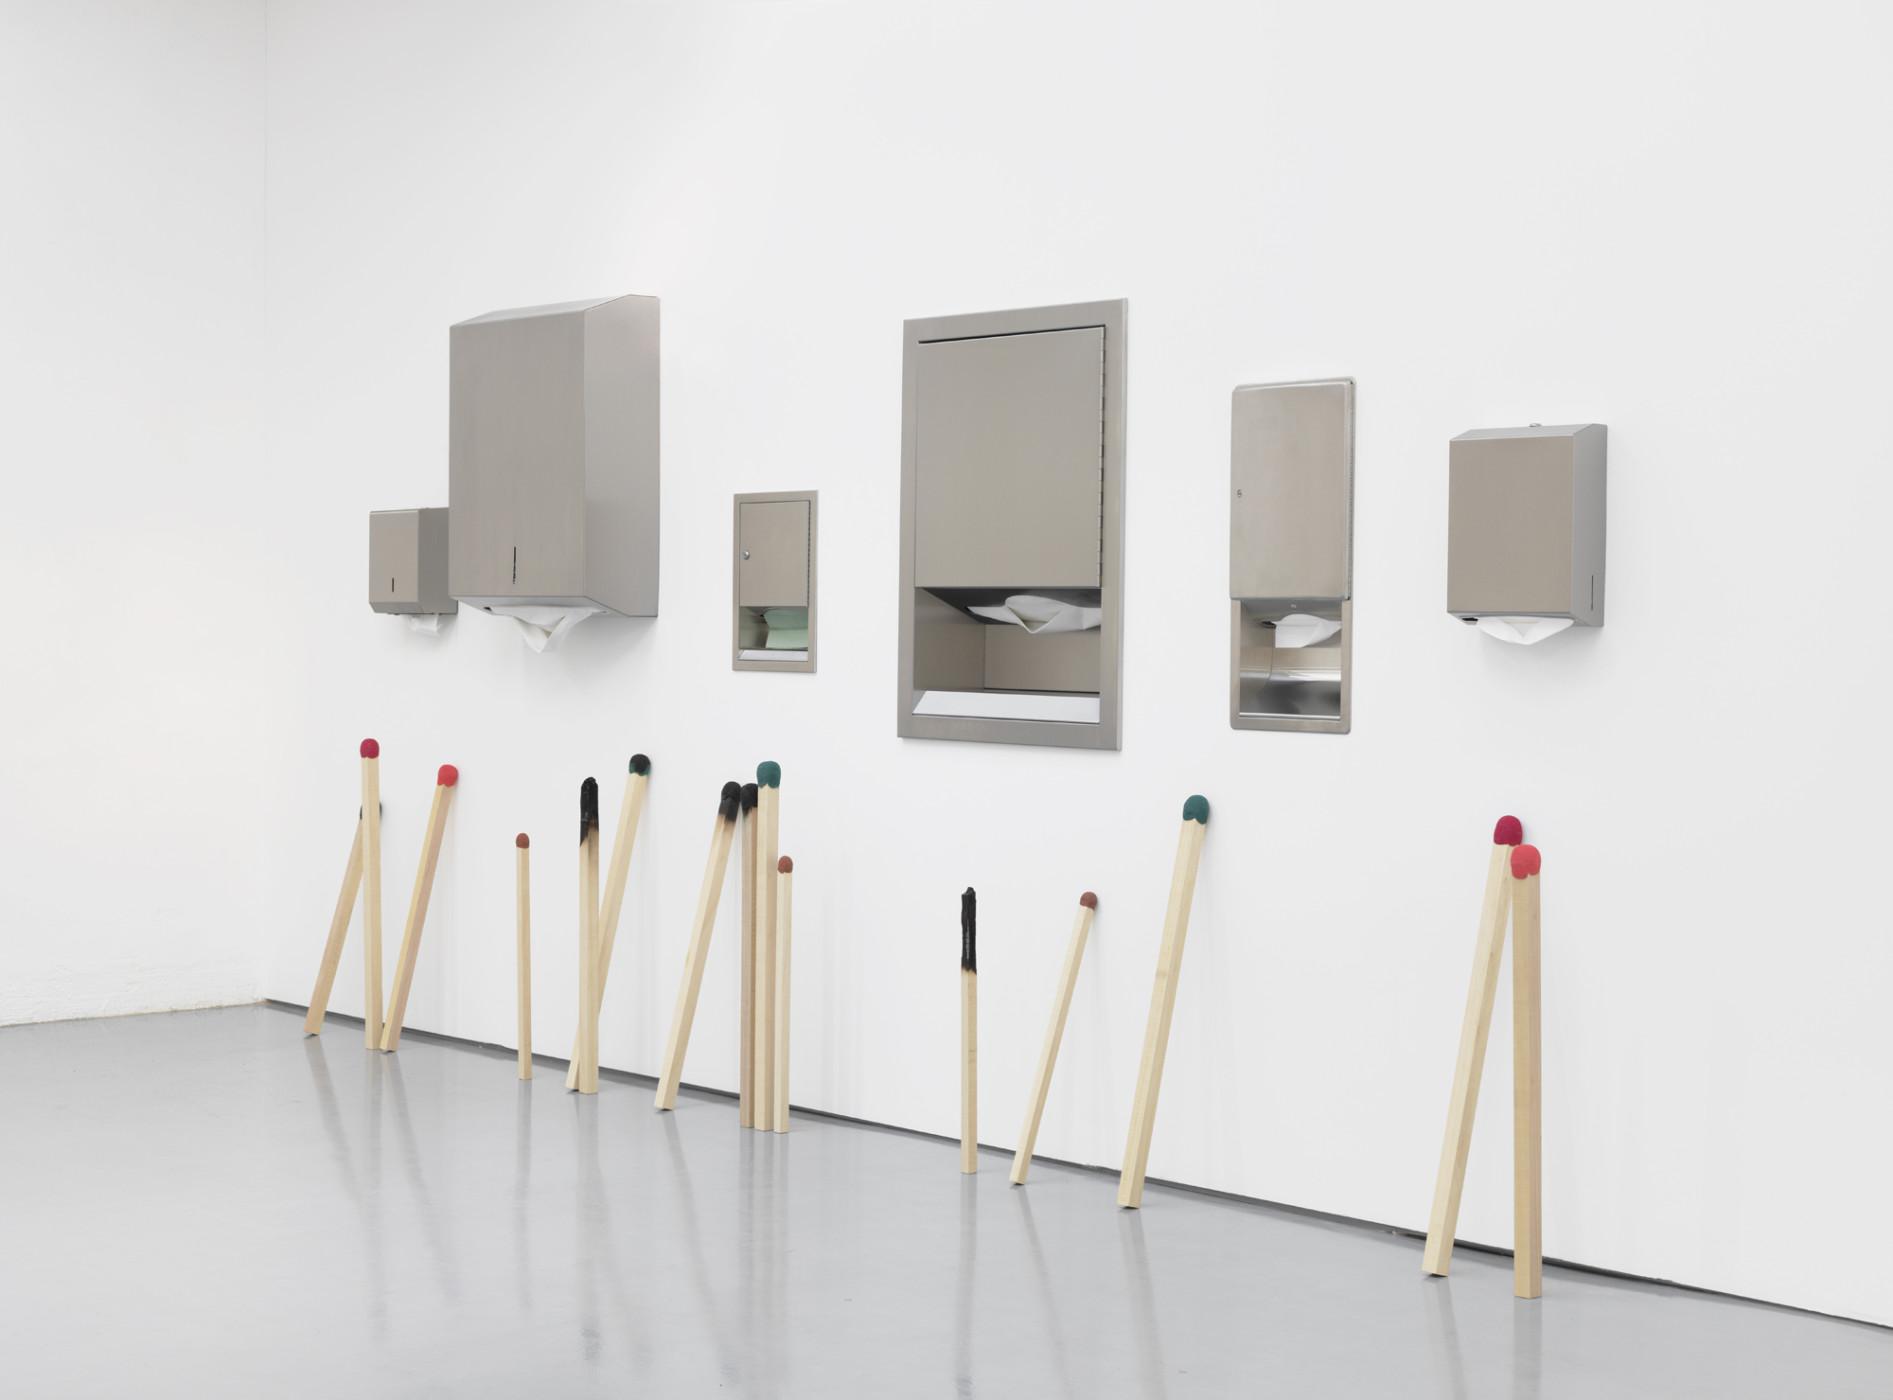 "<div class=""title""><em>Waiting, Giving, Spent</em>, 2012</div><div class=""medium"">brushed steel paper towel dispensers, paper towels, wooden matchsticks</div><div class=""dimensions"">201.0 x 435.0 x 28.0 cm<br />79 1/8 x 171 1/4 x 11 in.</div>"